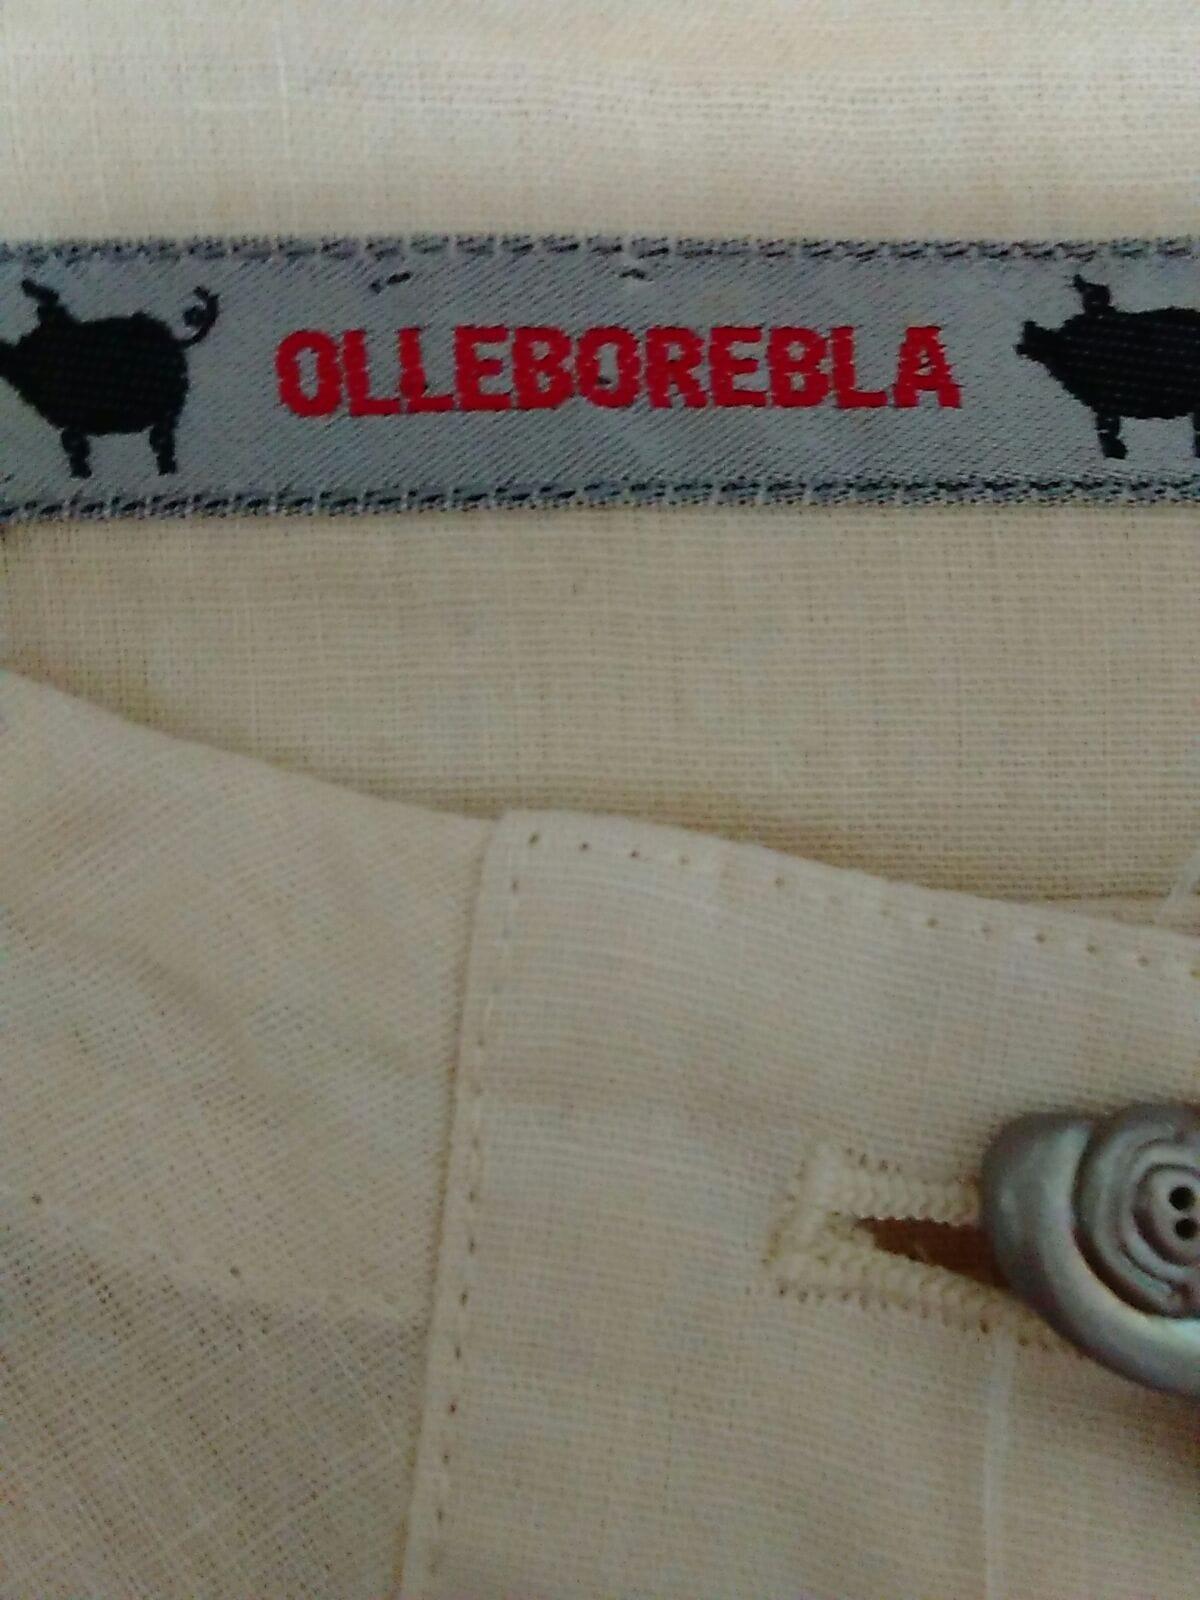 OLLEBOREBLA(アルベロベロ)のパーカー